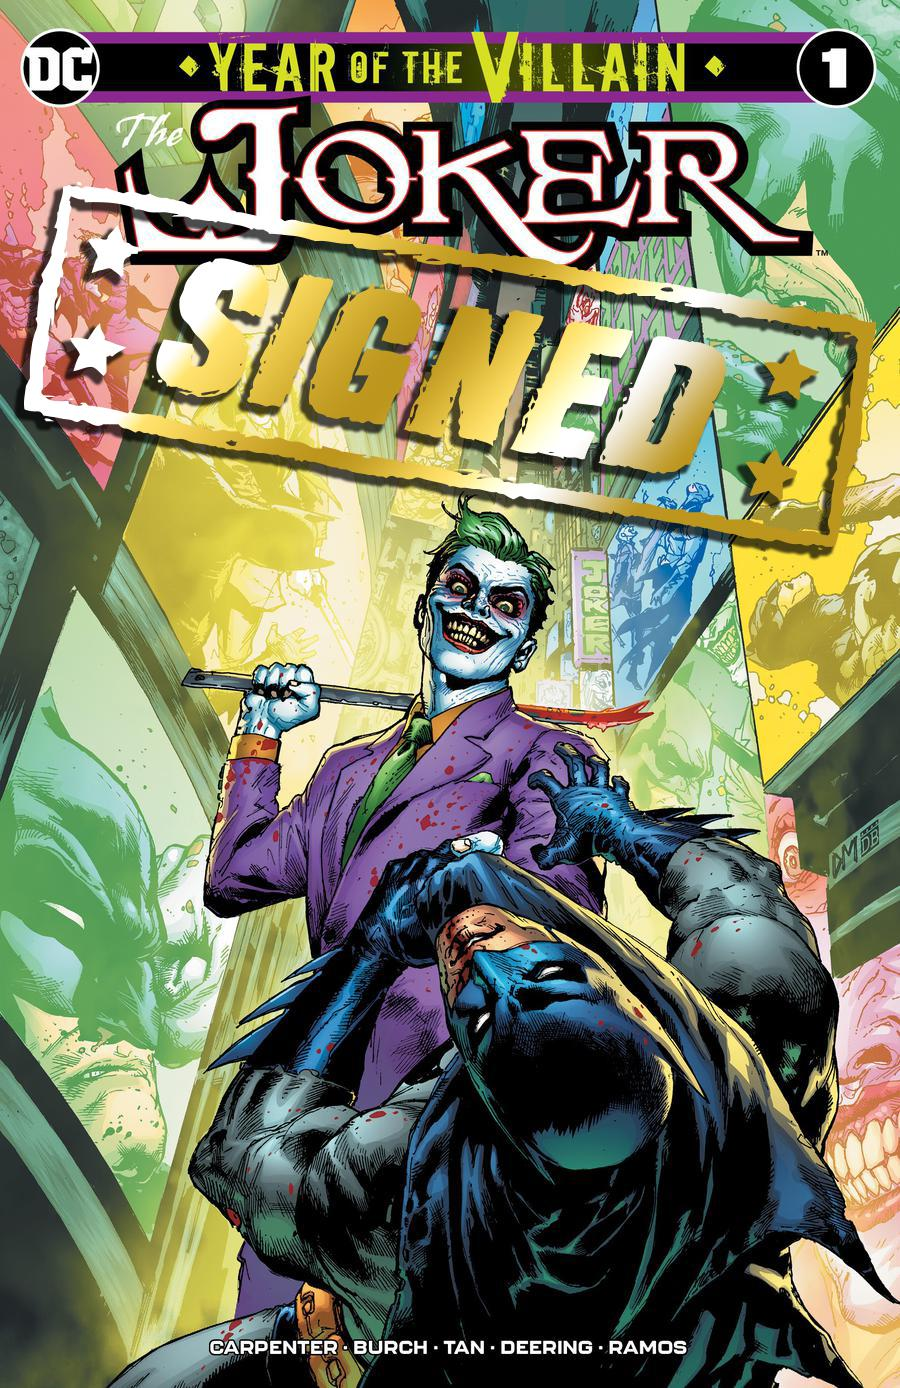 Joker Year Of The Villain #1  Midtown Exclusive Doug Mahnke Variant Cover Signed By Doug Mahnke